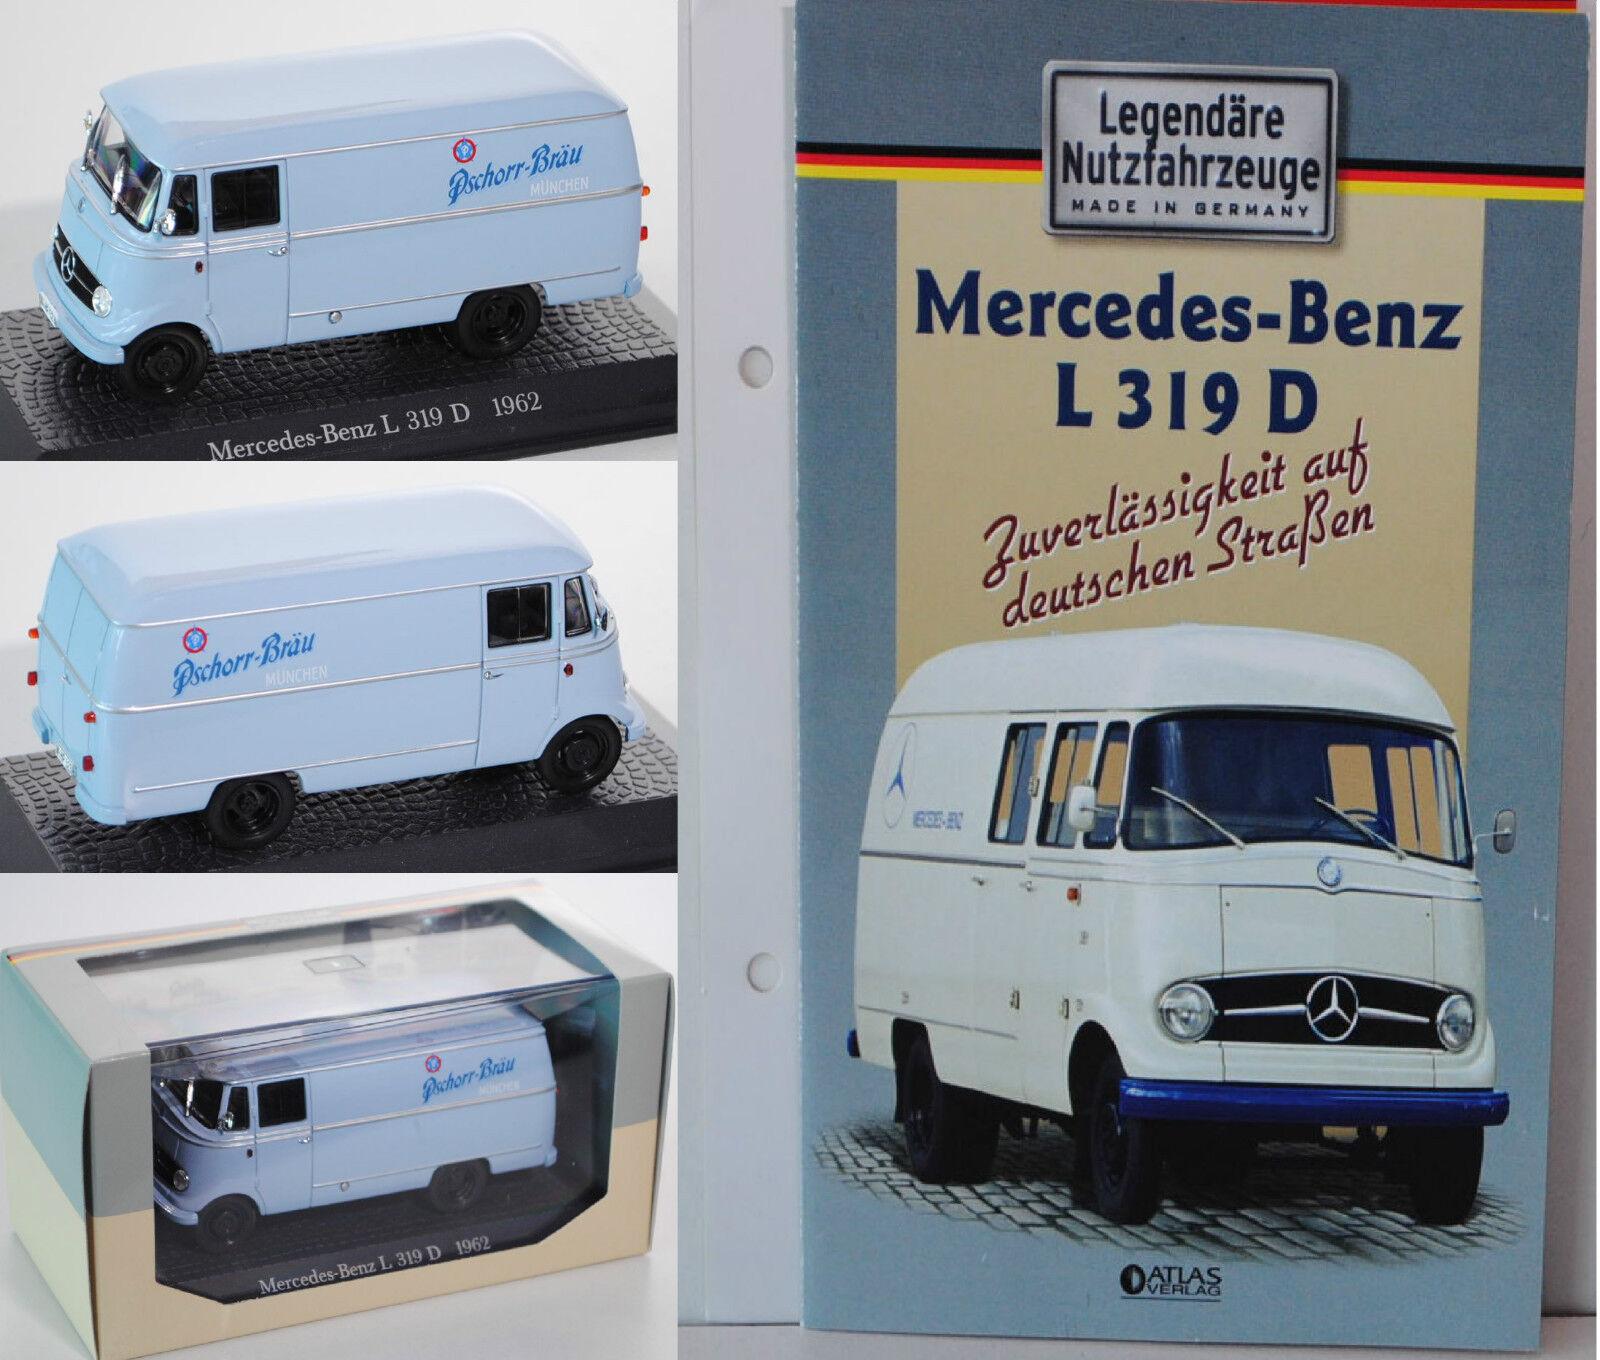 Atlas 7421105 mercedes benz l 319 d kastenwagen, pschorr br ä u   m ü nchen 1 43 ovp